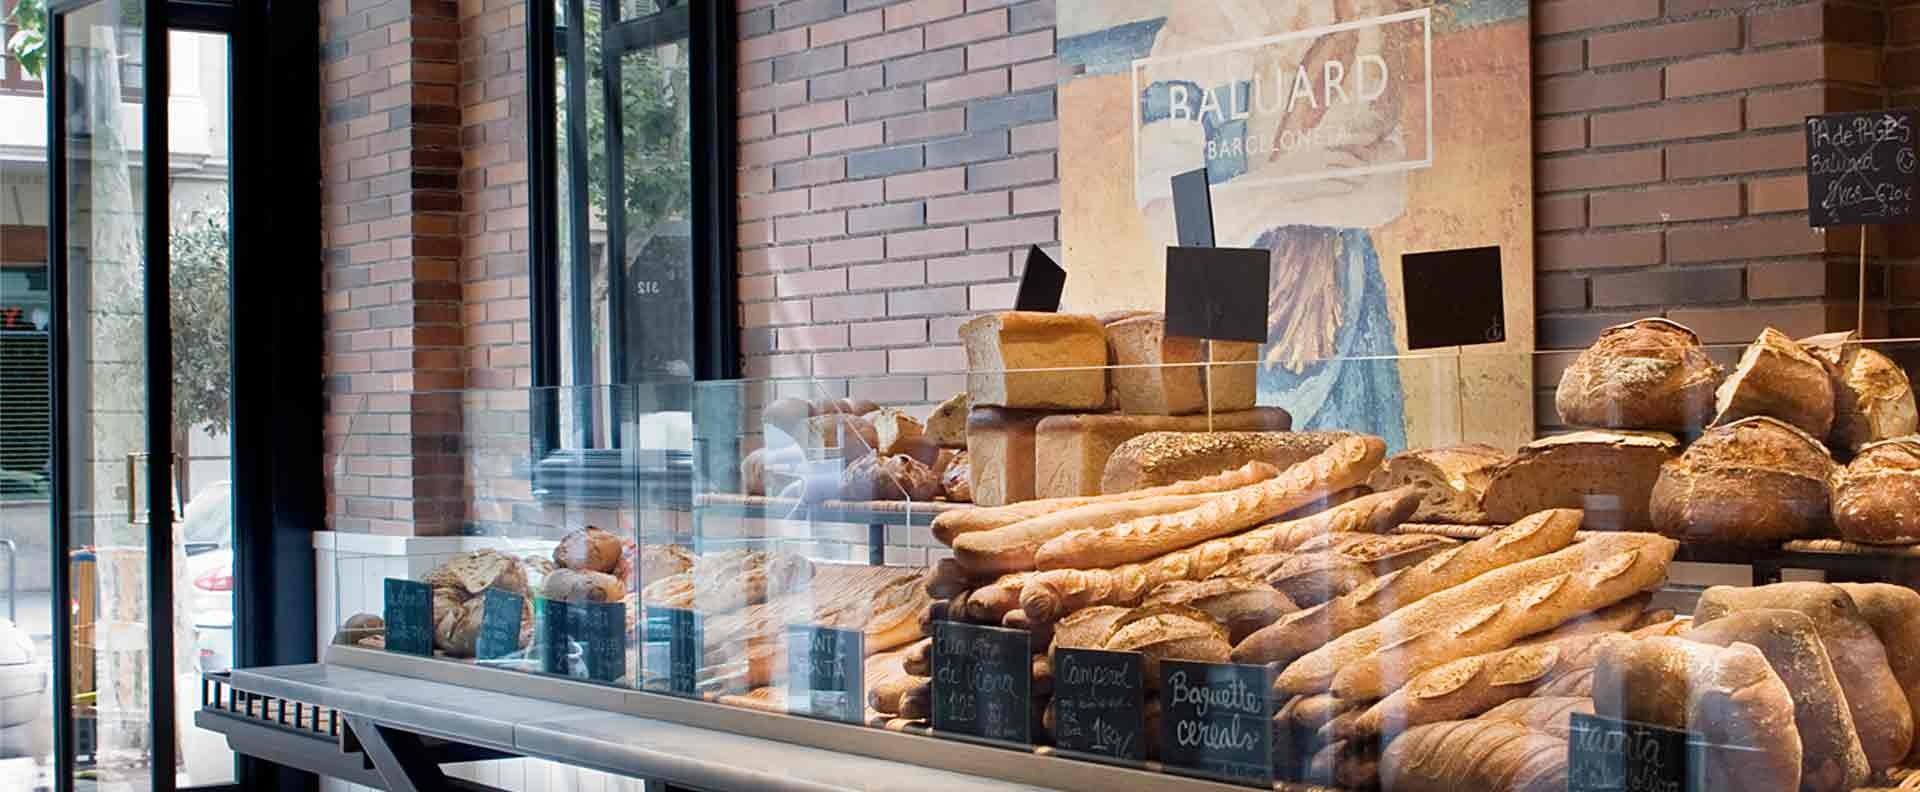 Praktik Bakery